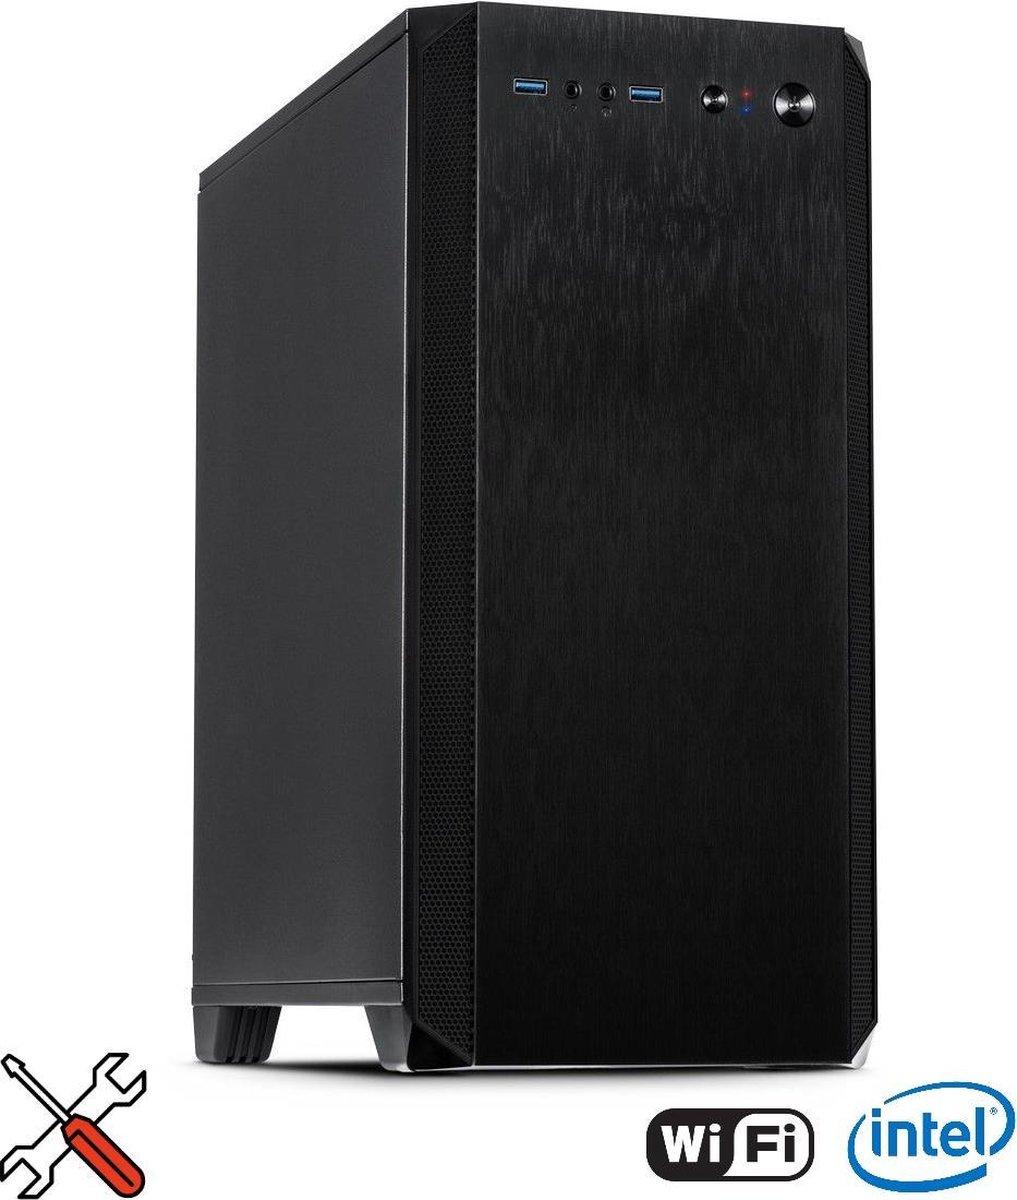 Home/Office PC – 240GB SSD + 1 TB HDD – Intel® Core™ i3 – 8 GB RAM – Zakelijke PC – Windows Wifi PC